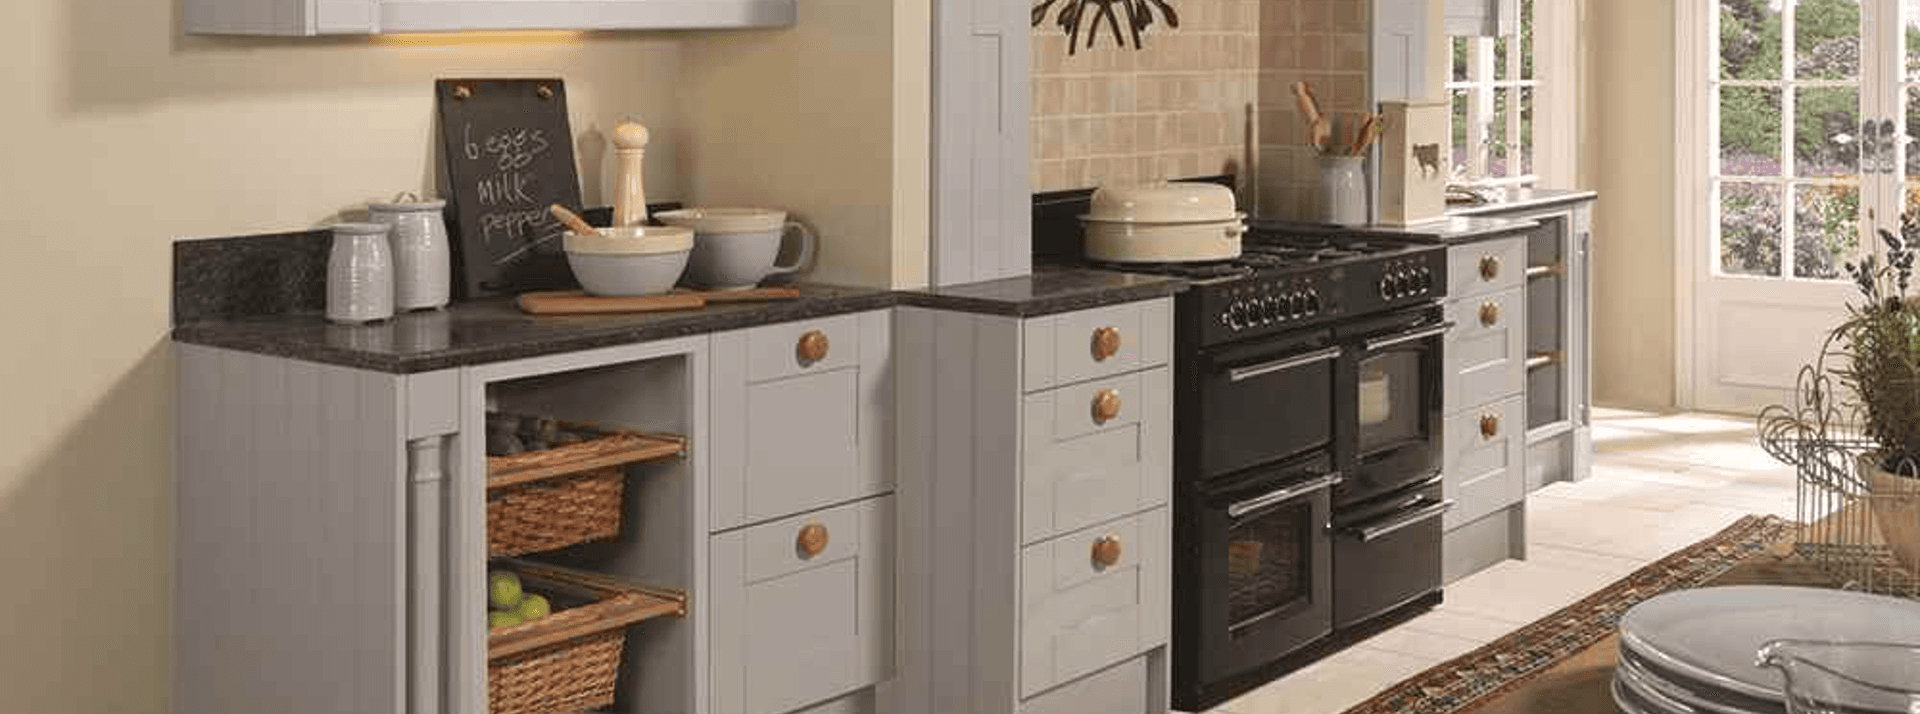 Norwich Bathrooms Kitchens Ltd